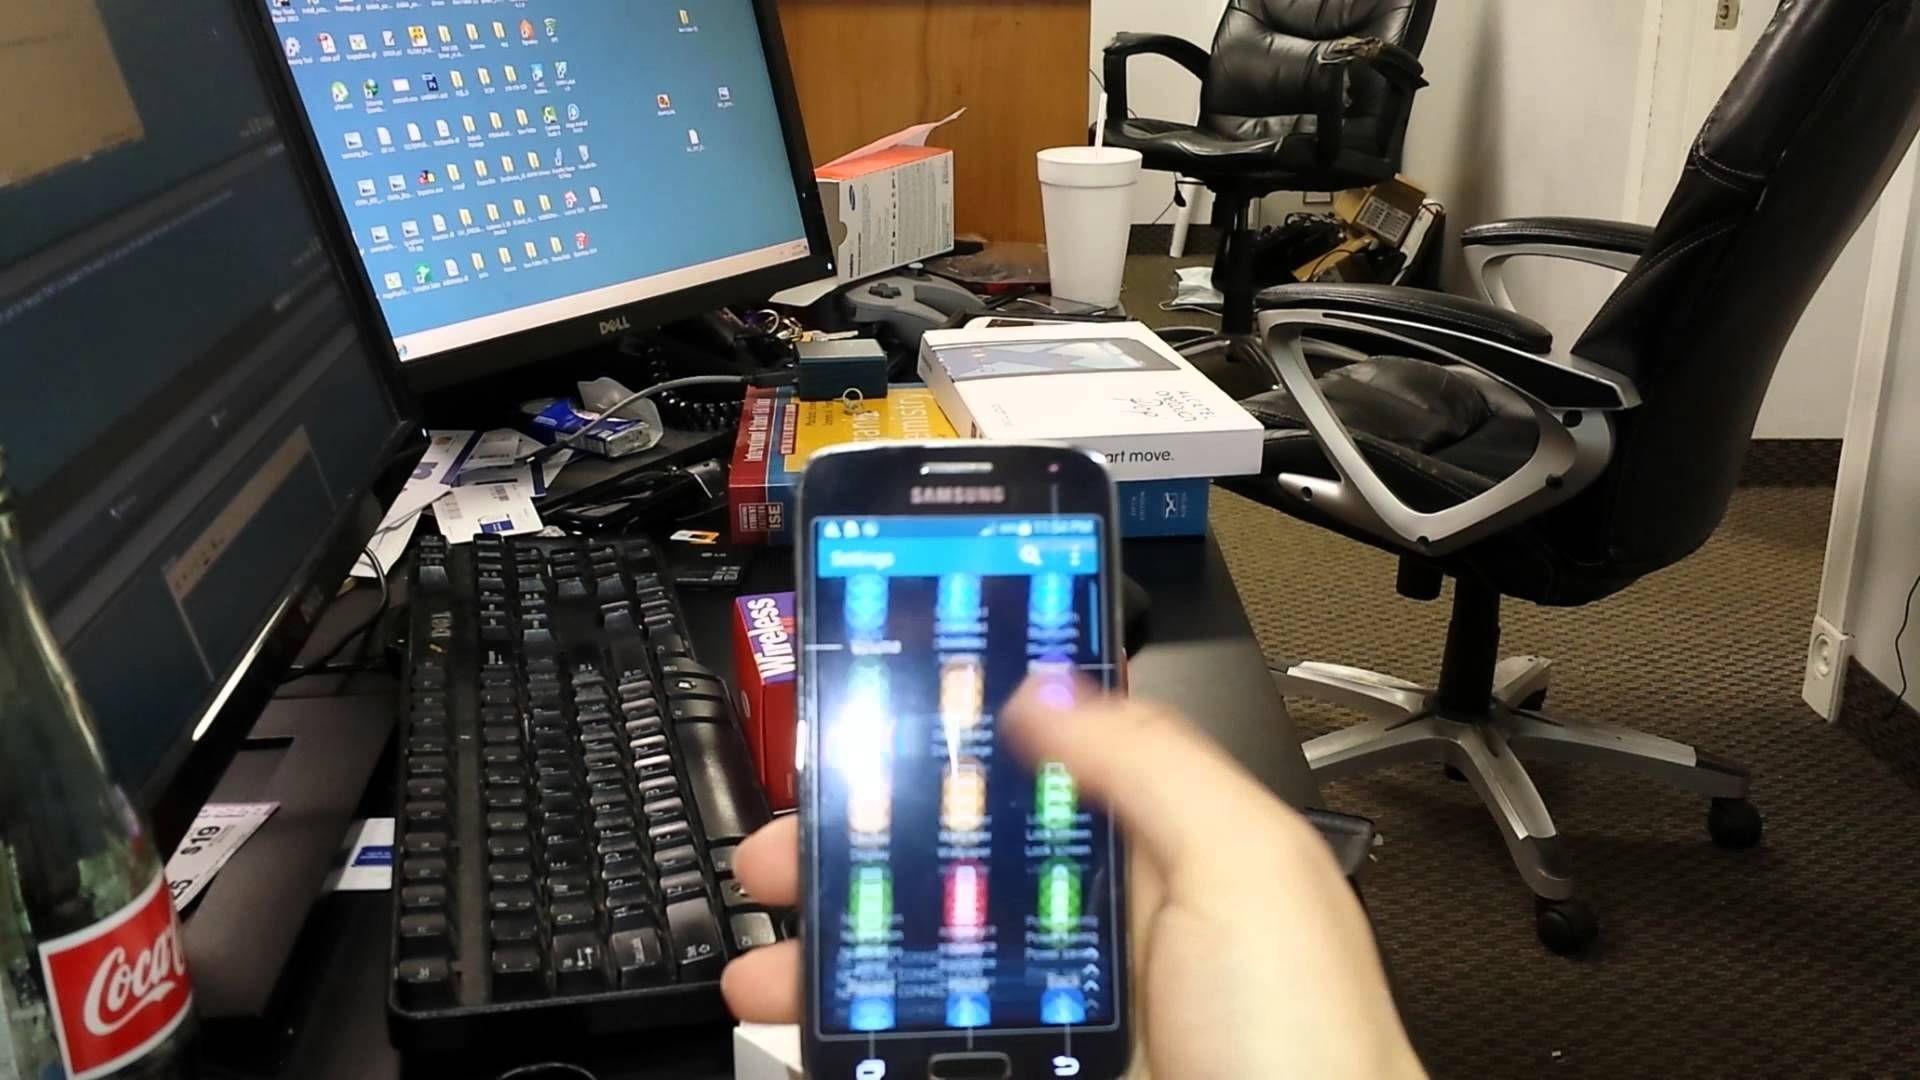 Res: 1920x1080, Samsung Galaxy Avant MetroPCS Review Unboxx - YouTube